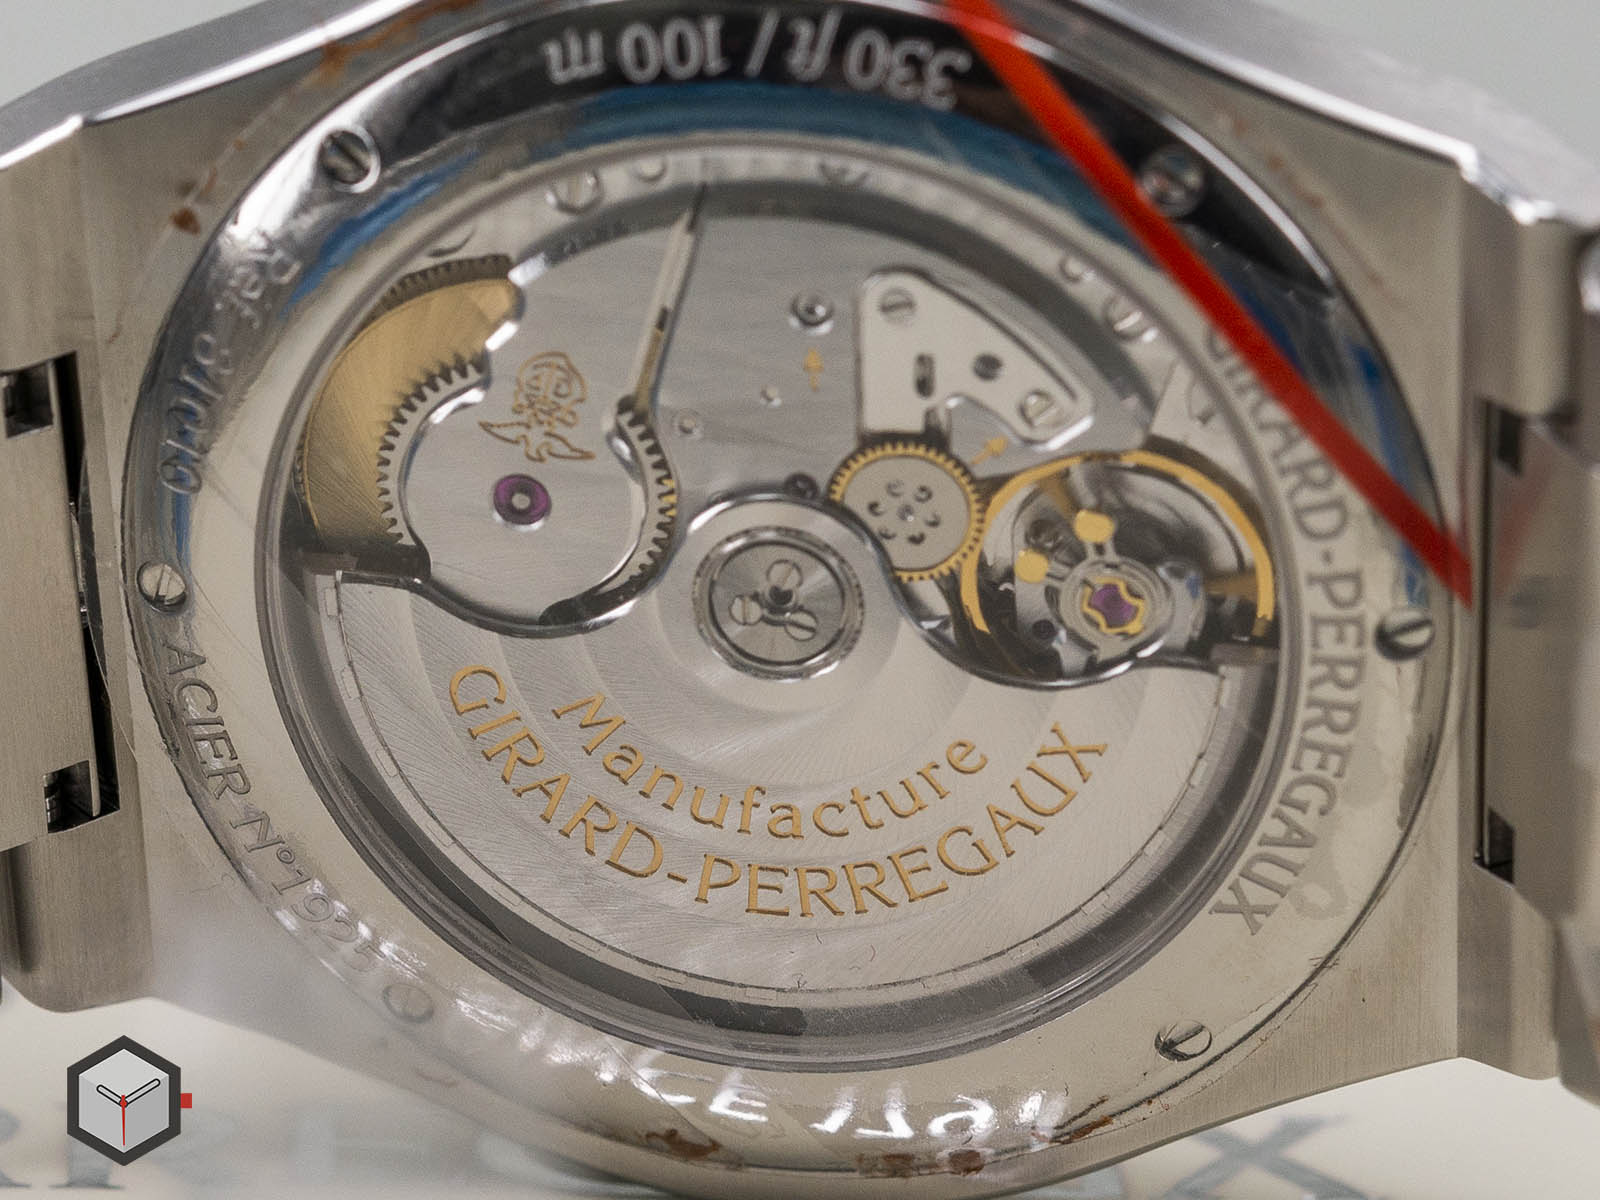 girard-perregaux-laureato-chronograph-42-mm-12.jpg